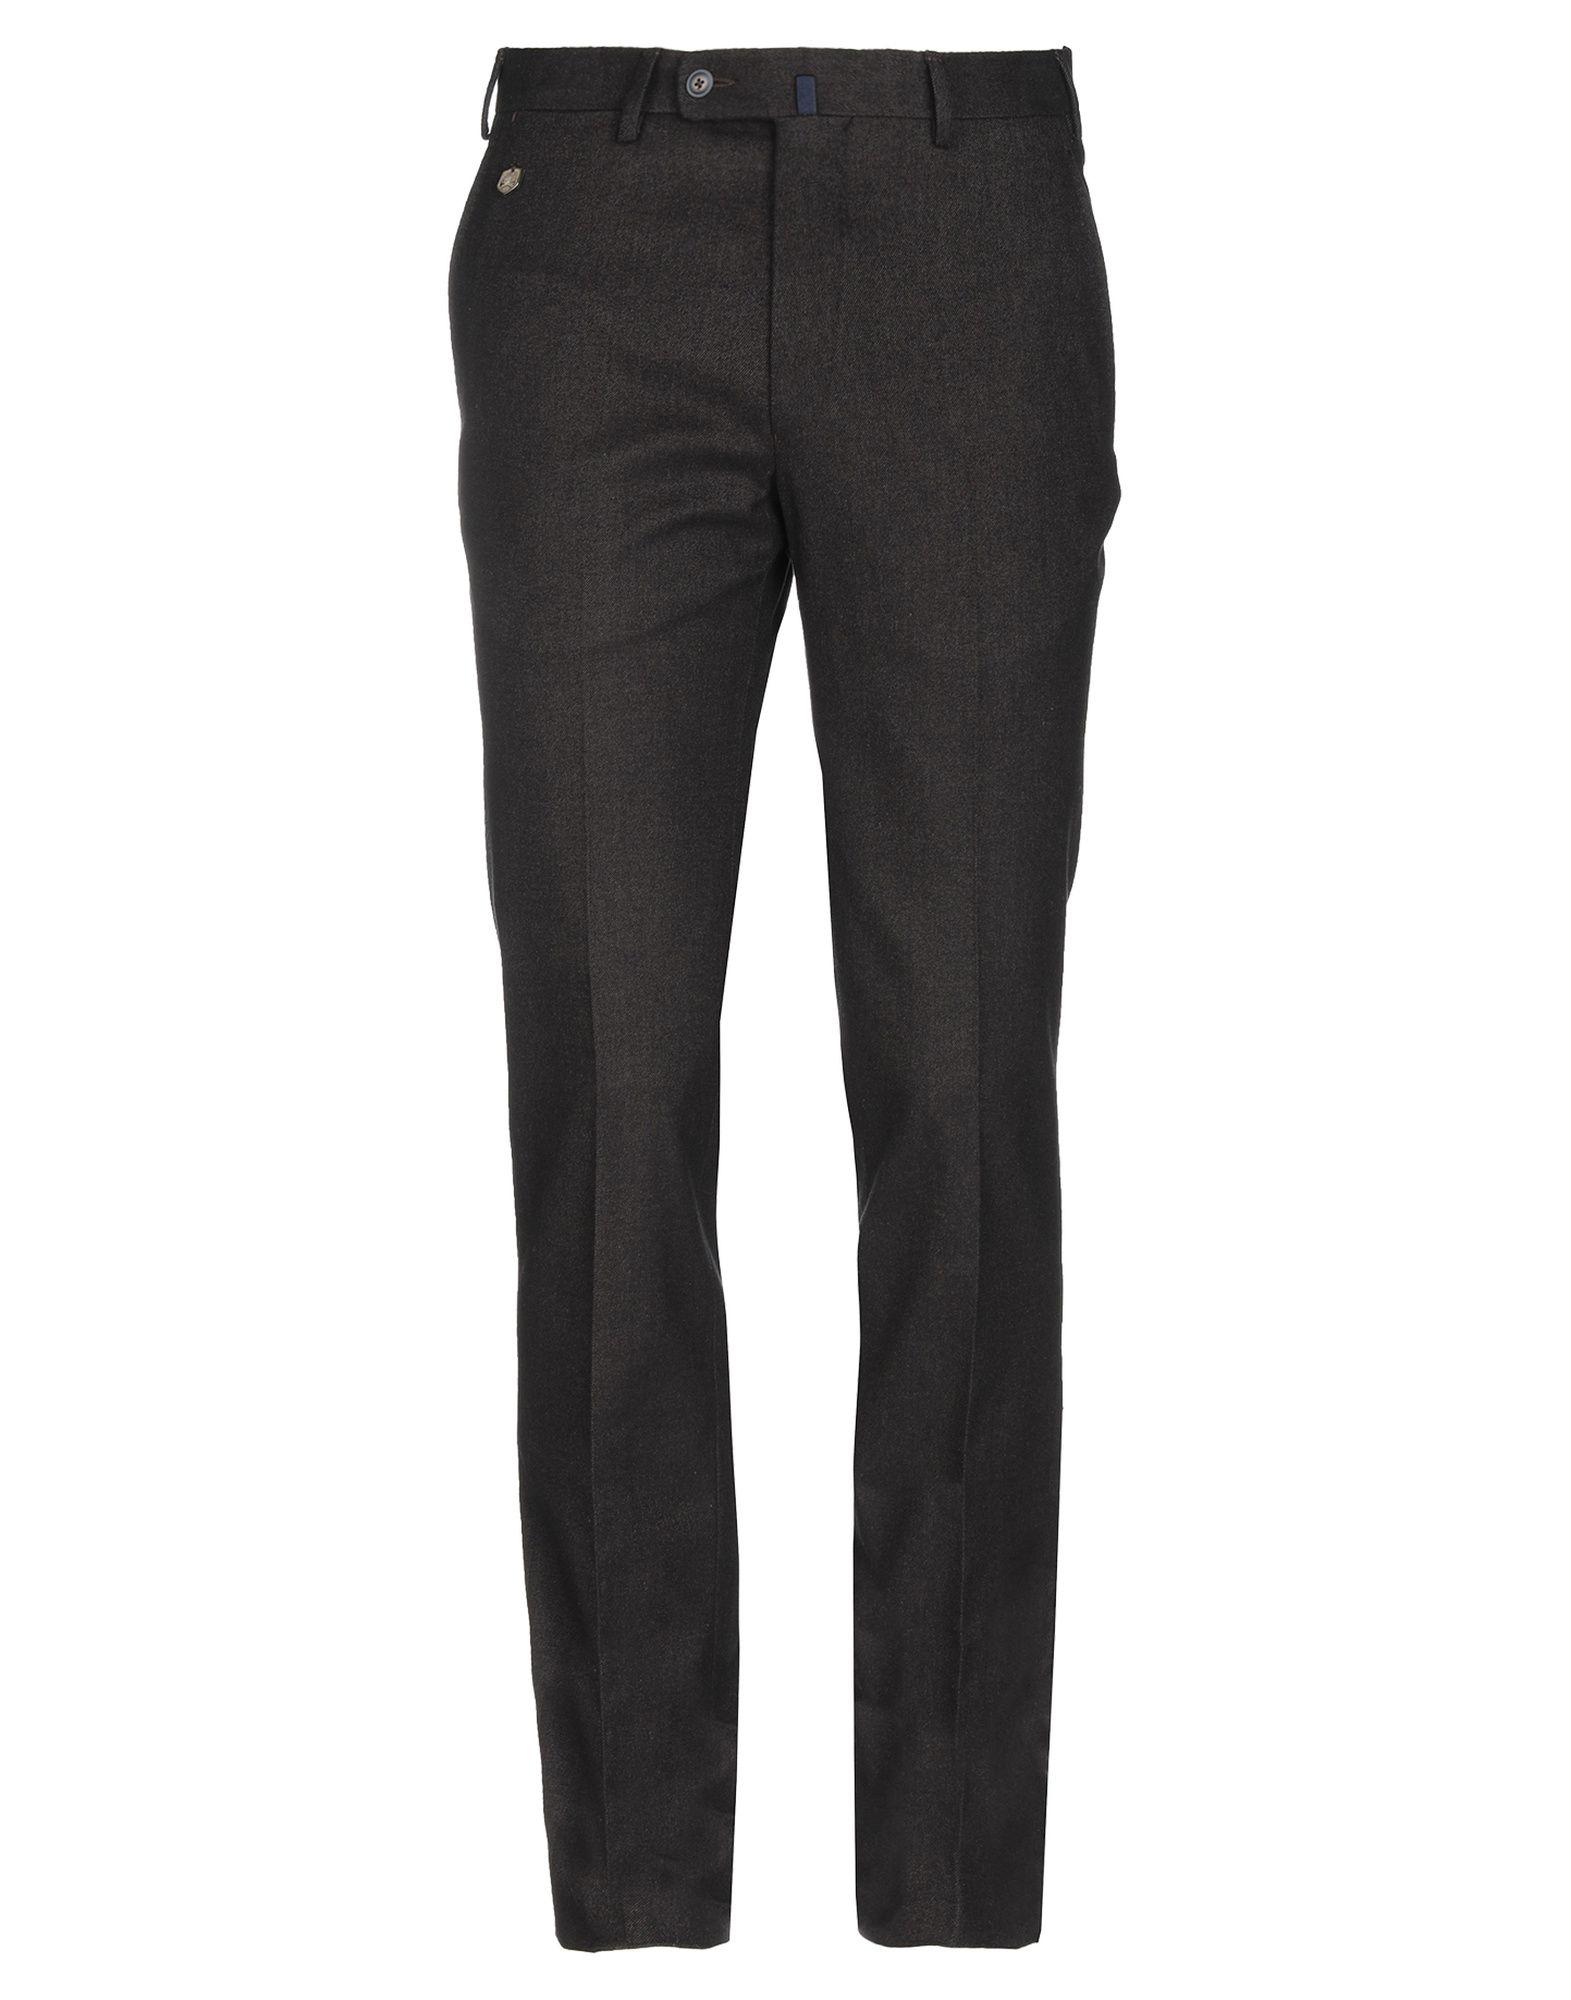 Pantalone Pantalone Pantalone Vigano' uomo - 13297983OK 73c